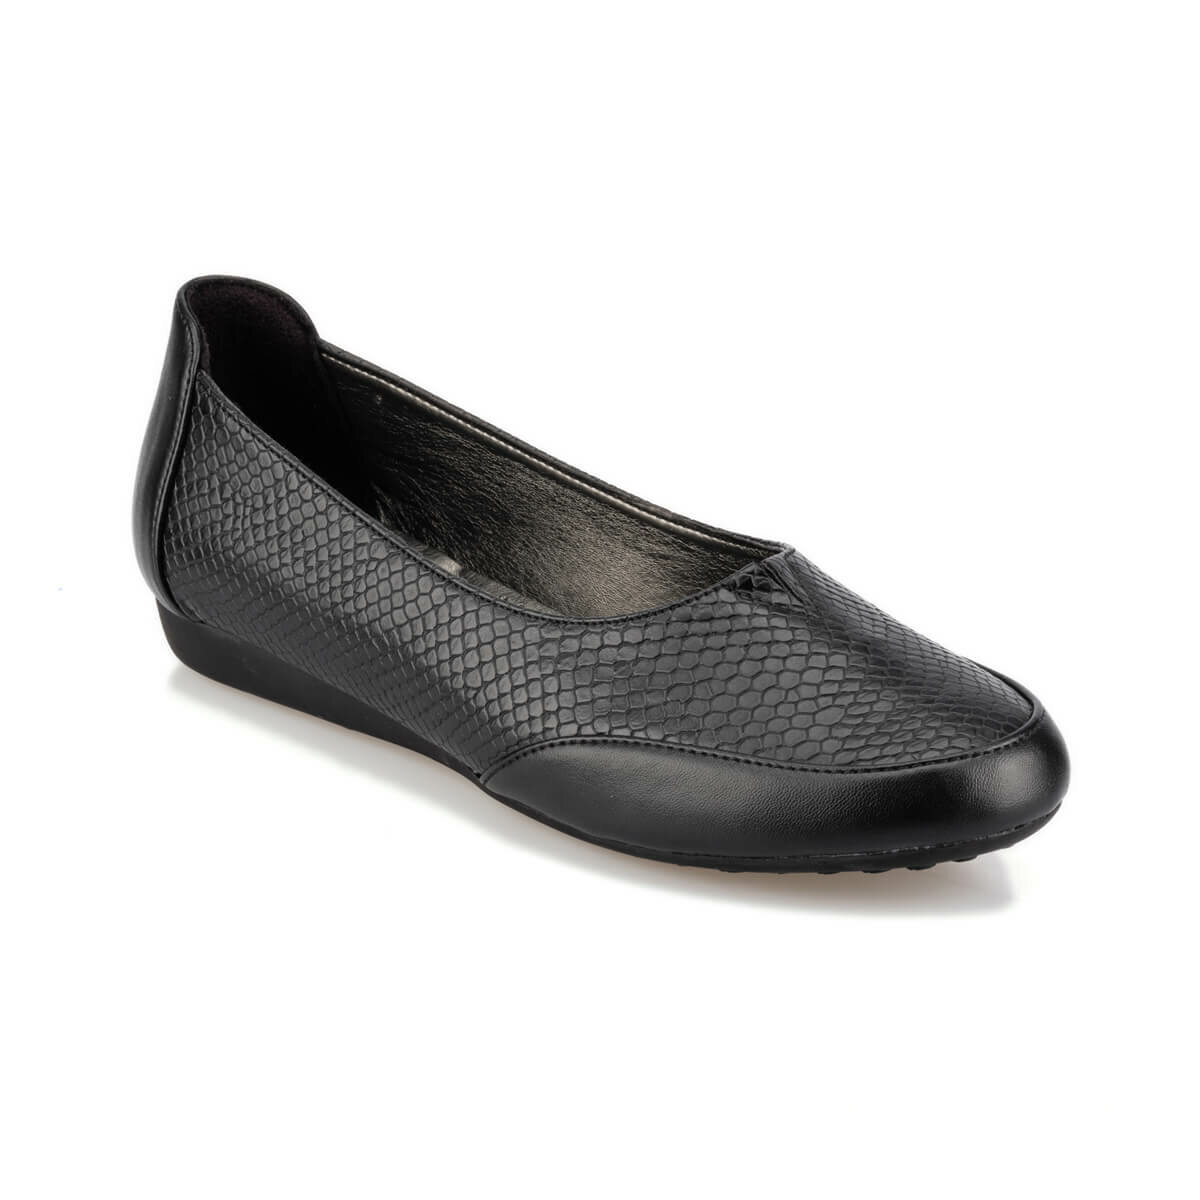 FLO 92.151008.Z Black Women Basic Comfort Polaris